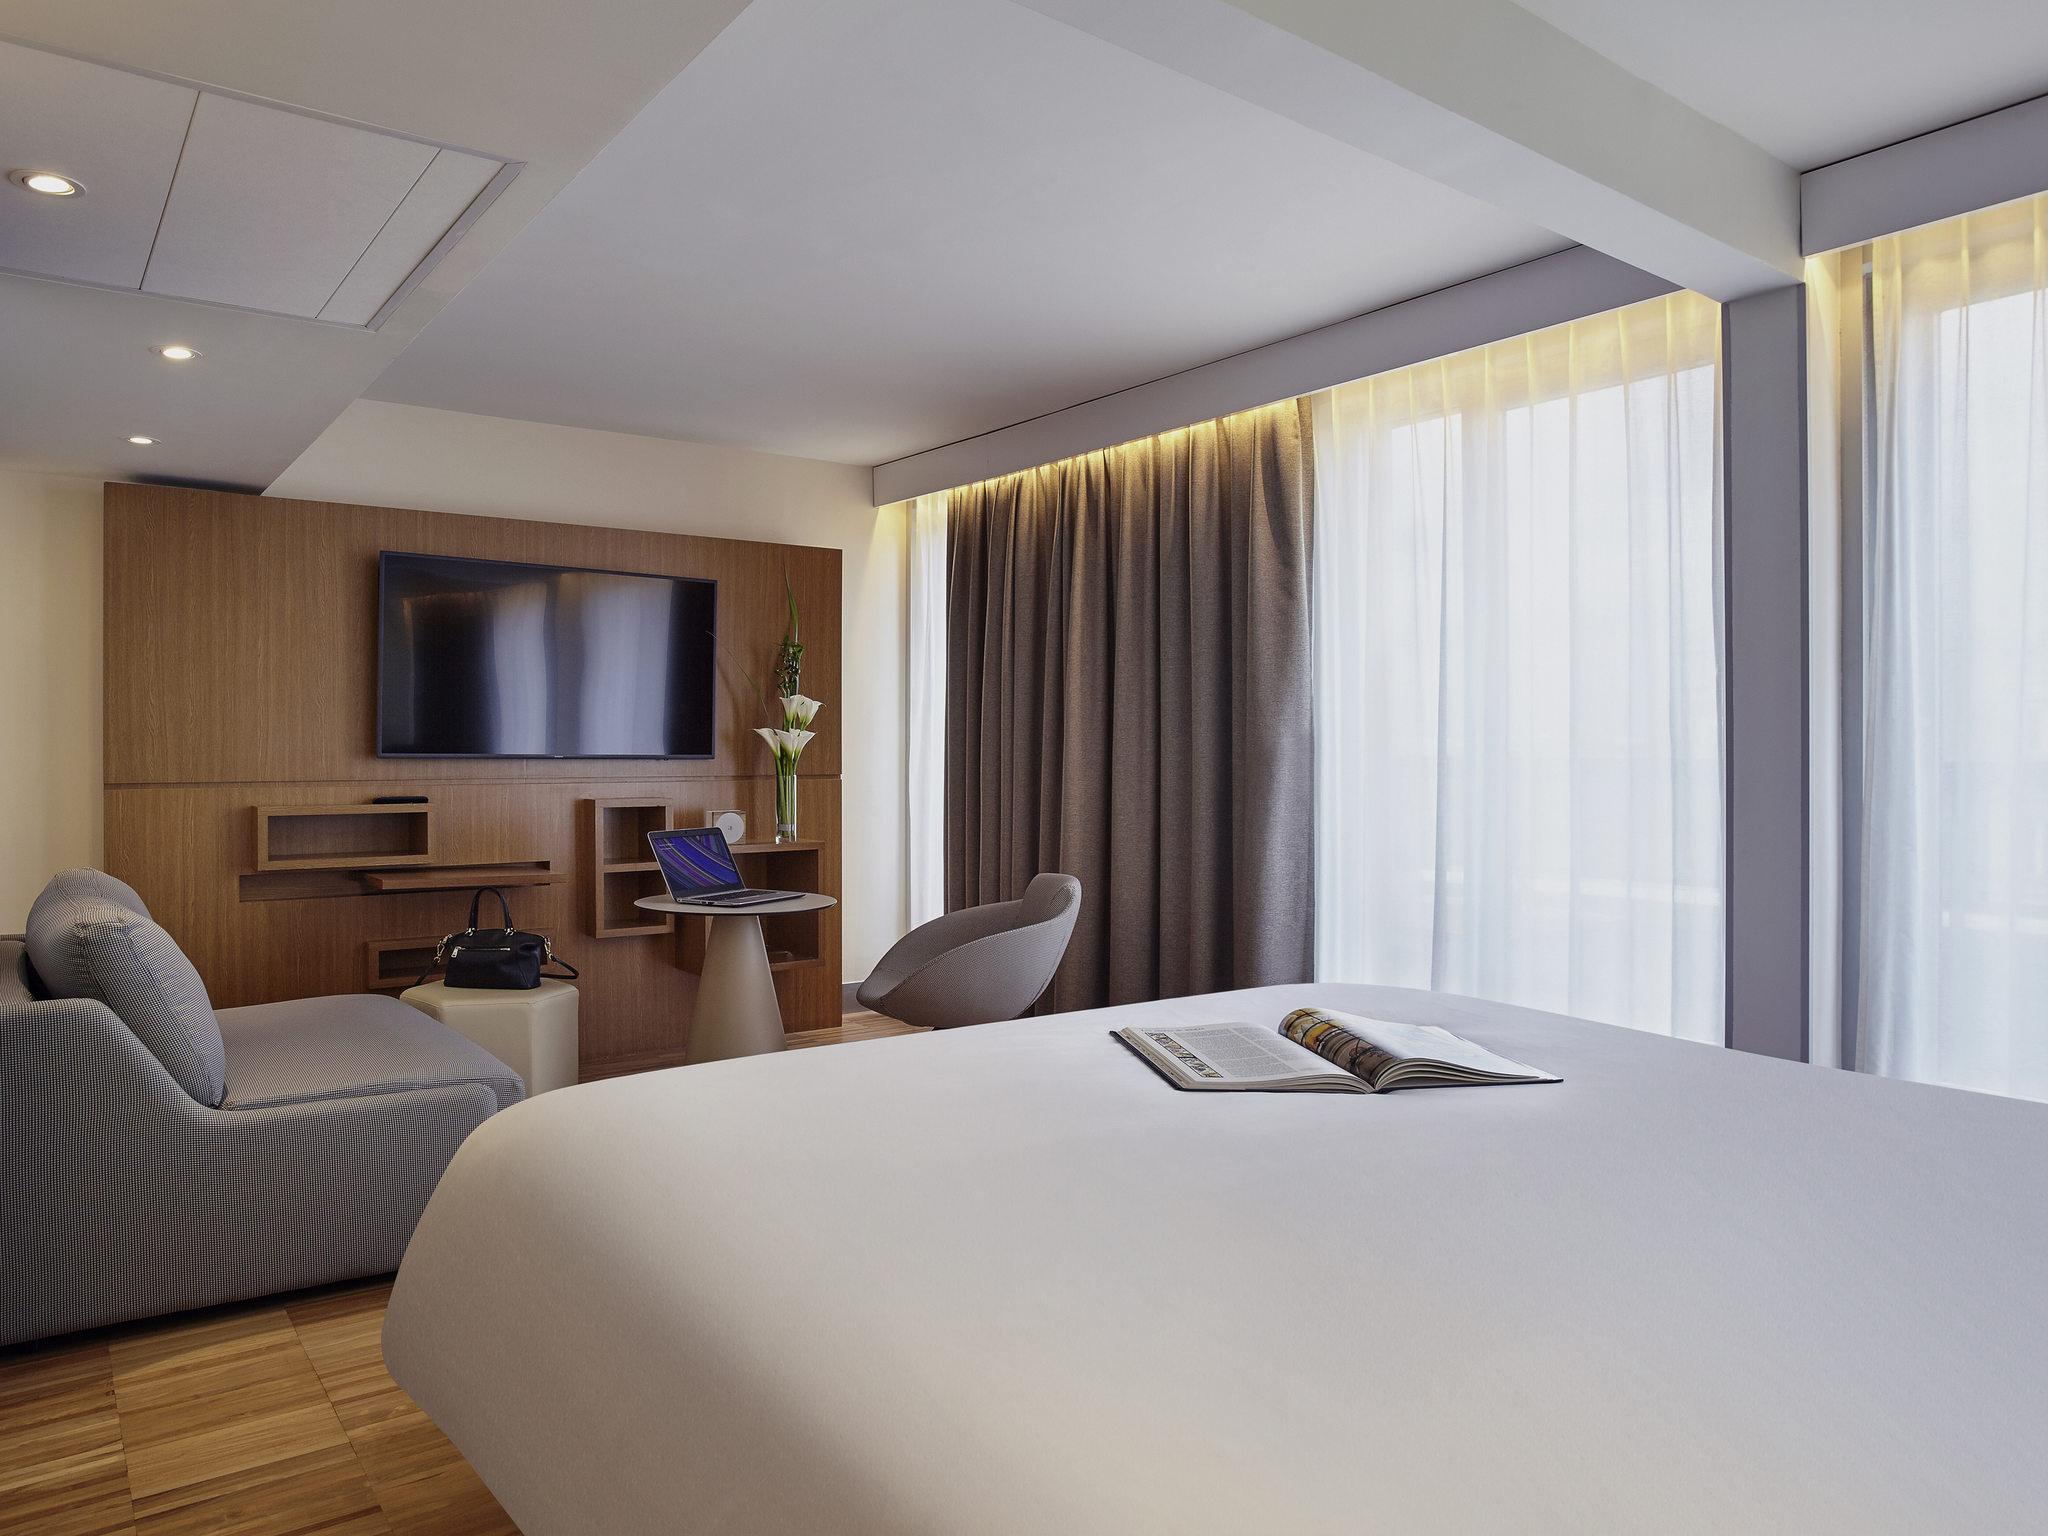 hotel in paris mercure paris arc de triomphe toile hotel rh meetings accorhotels com